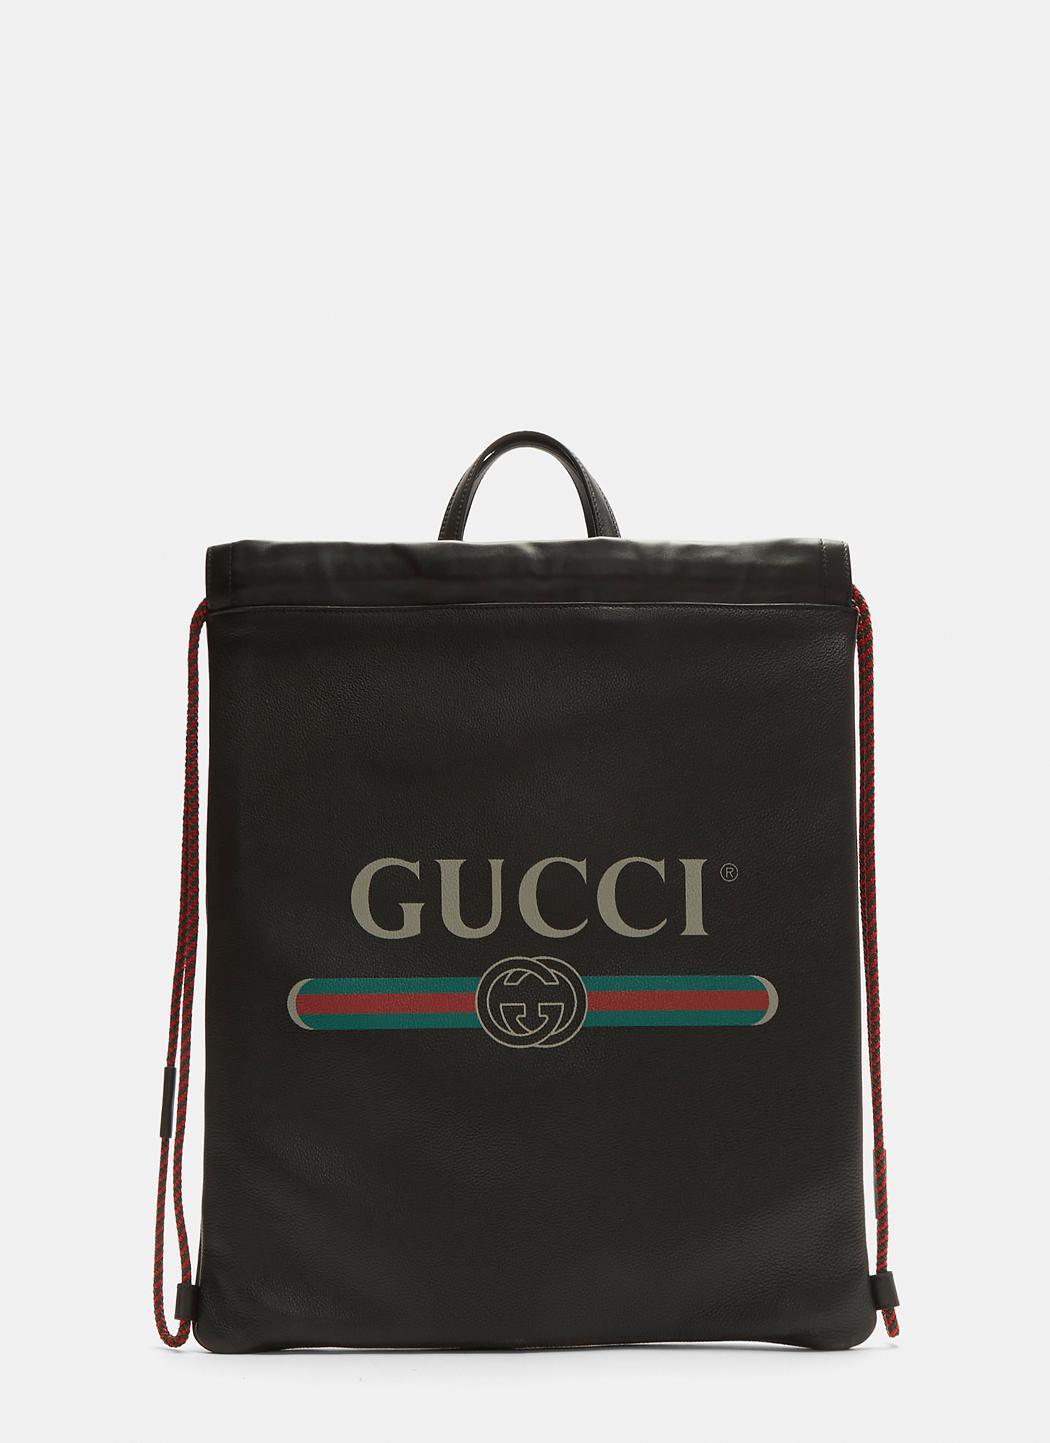 413f7395b24 Lyst - Gucci Print Zaino Bag In Black in Black